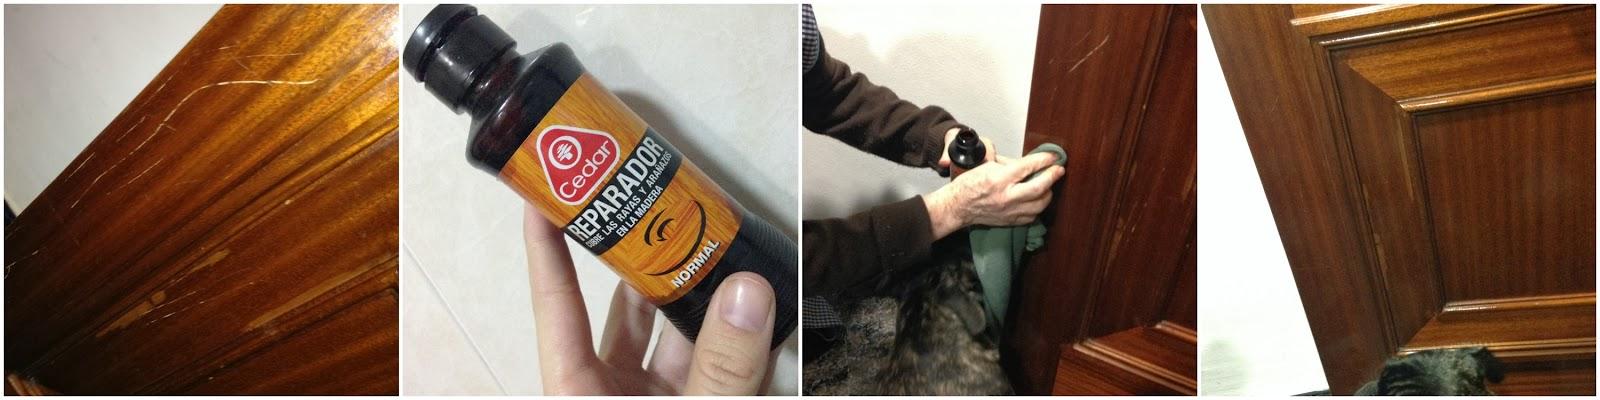 Reparador de arañazos madera